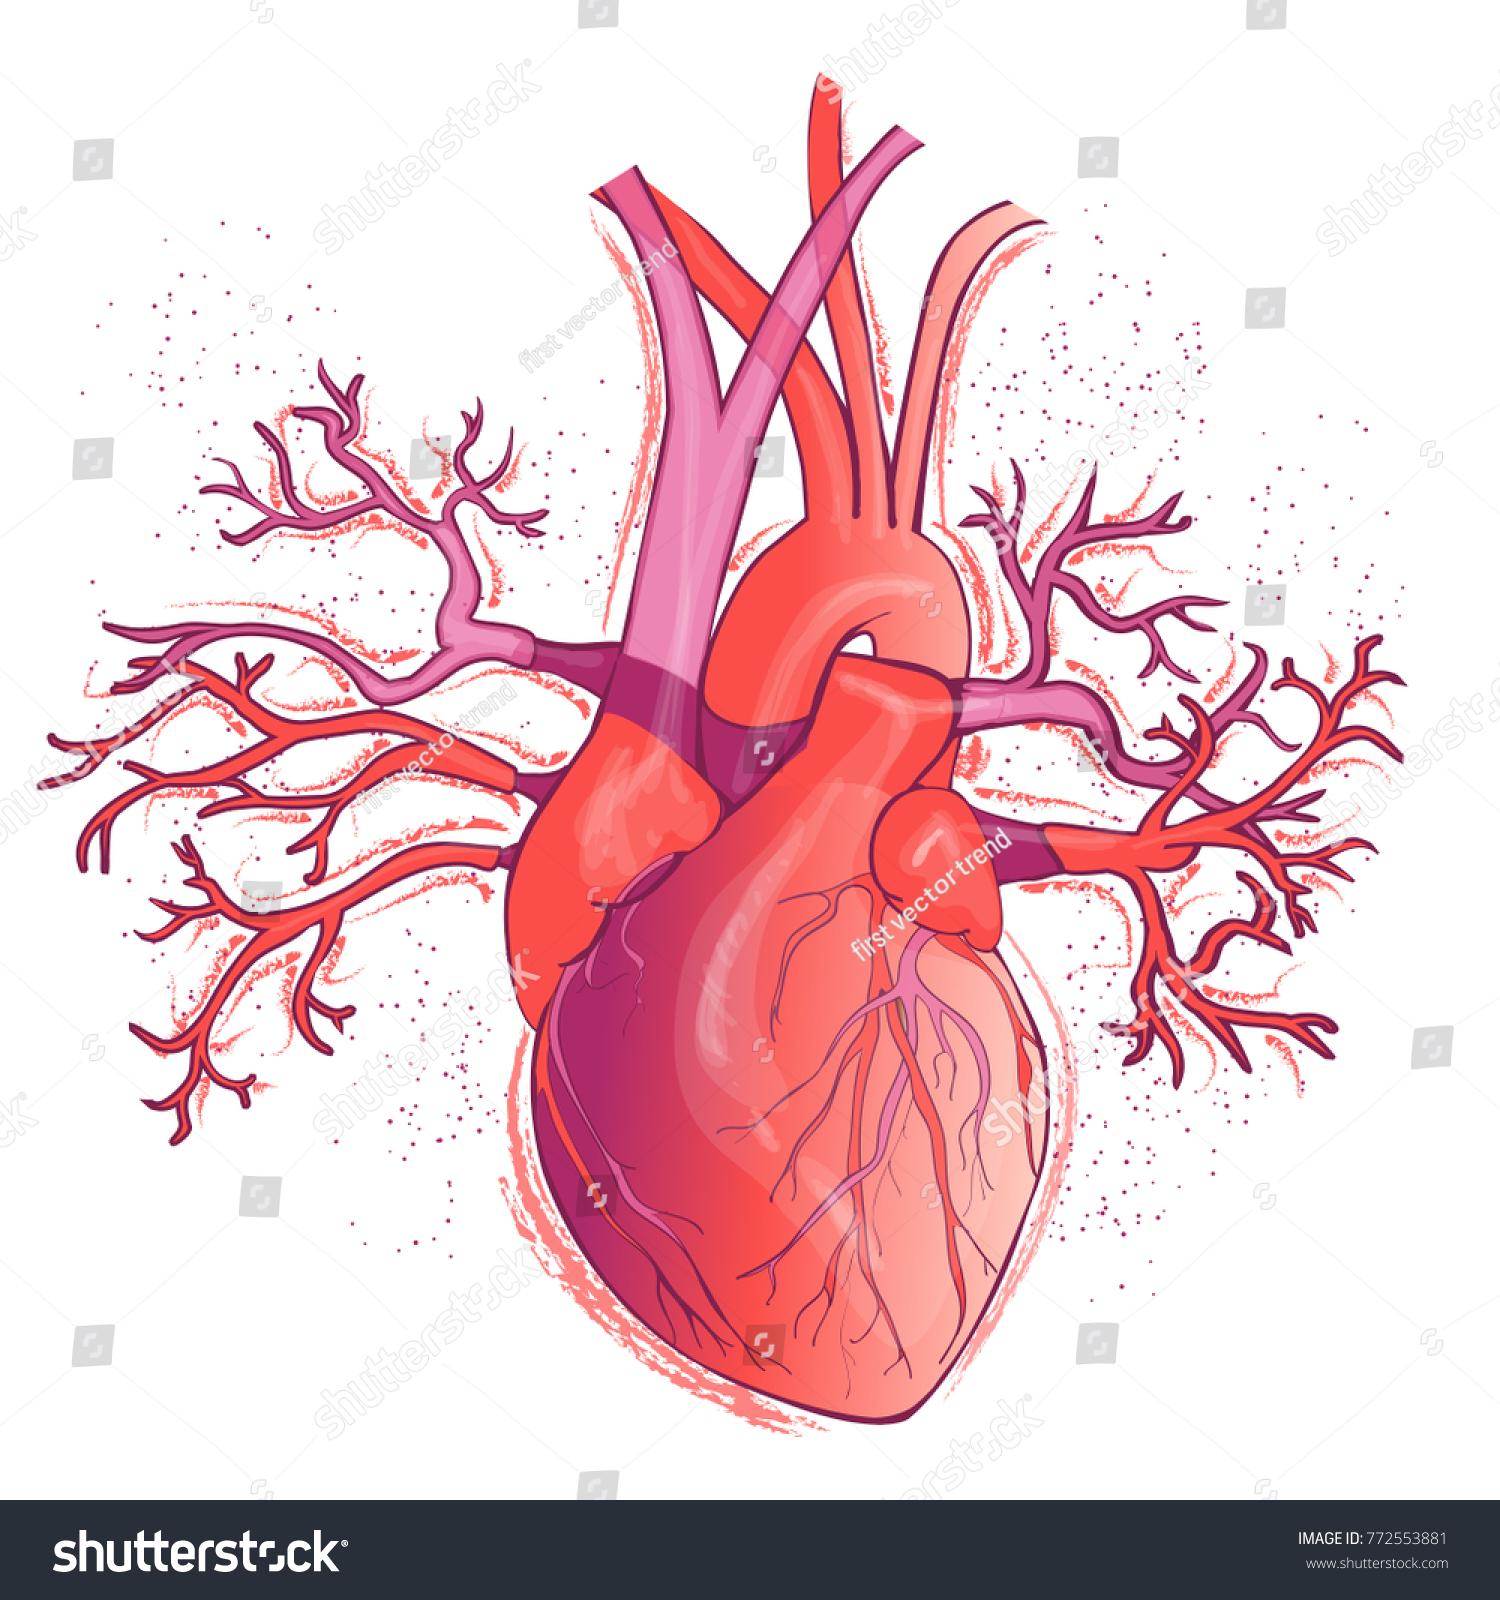 Vector Realistic Red Human Heart Internal Stock Vector 772553881 ...